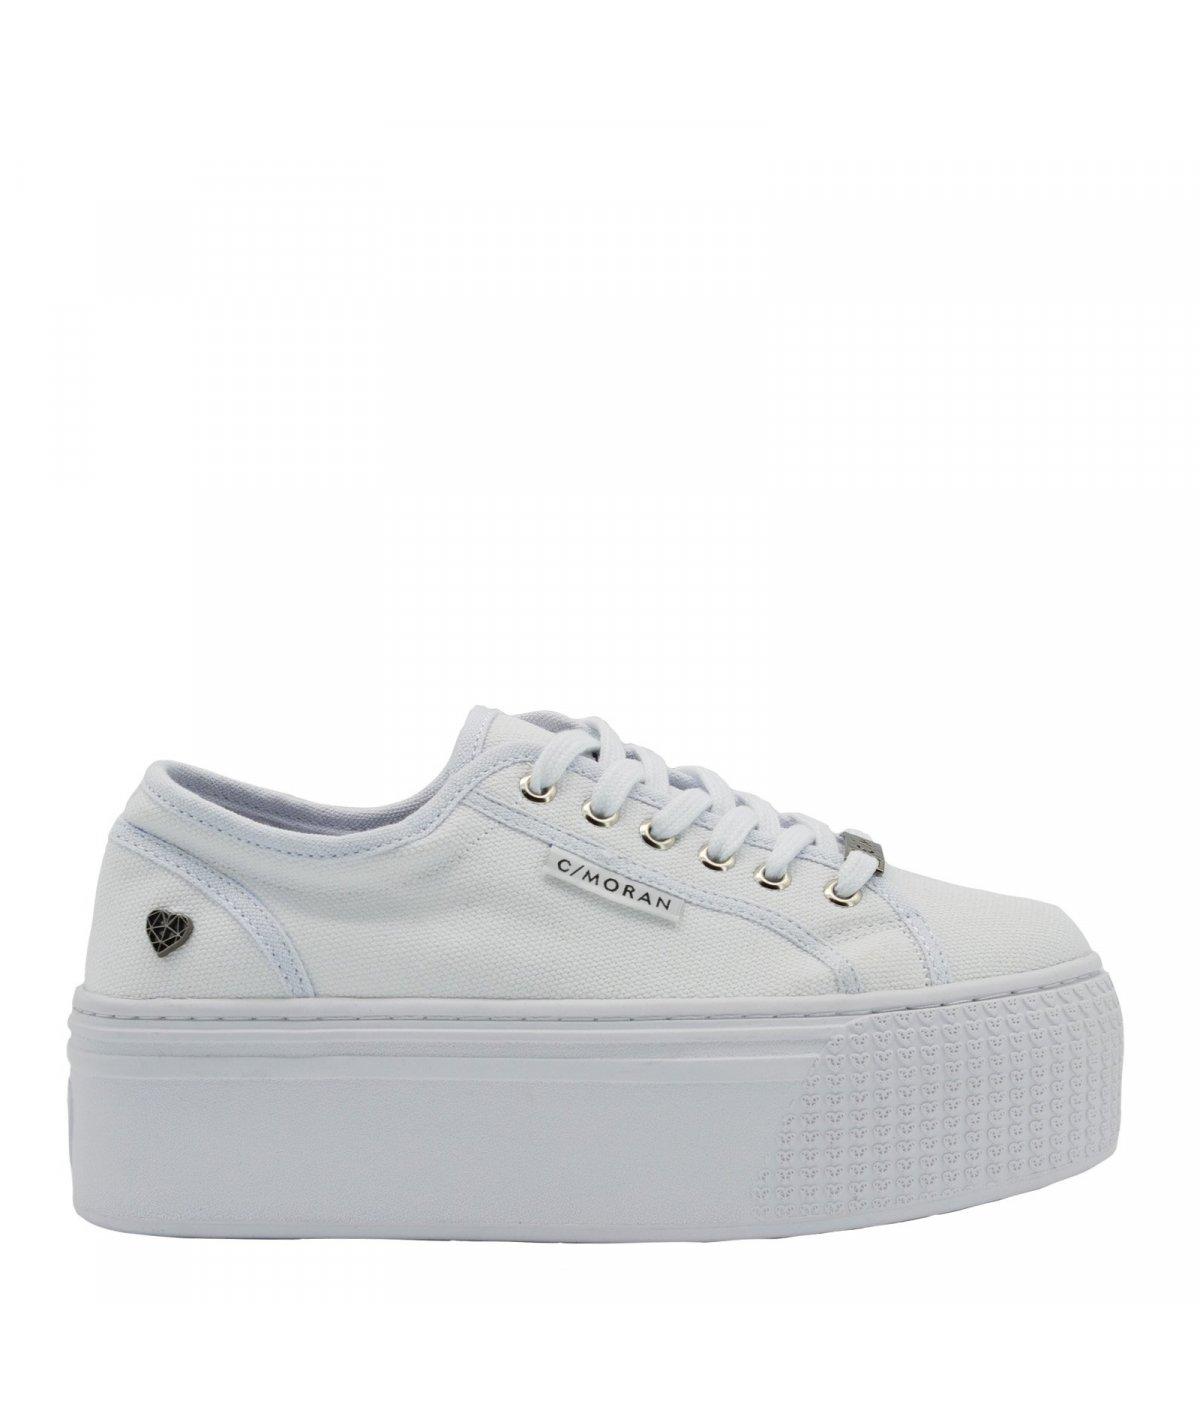 Zapatillas Mujer 236 Lona